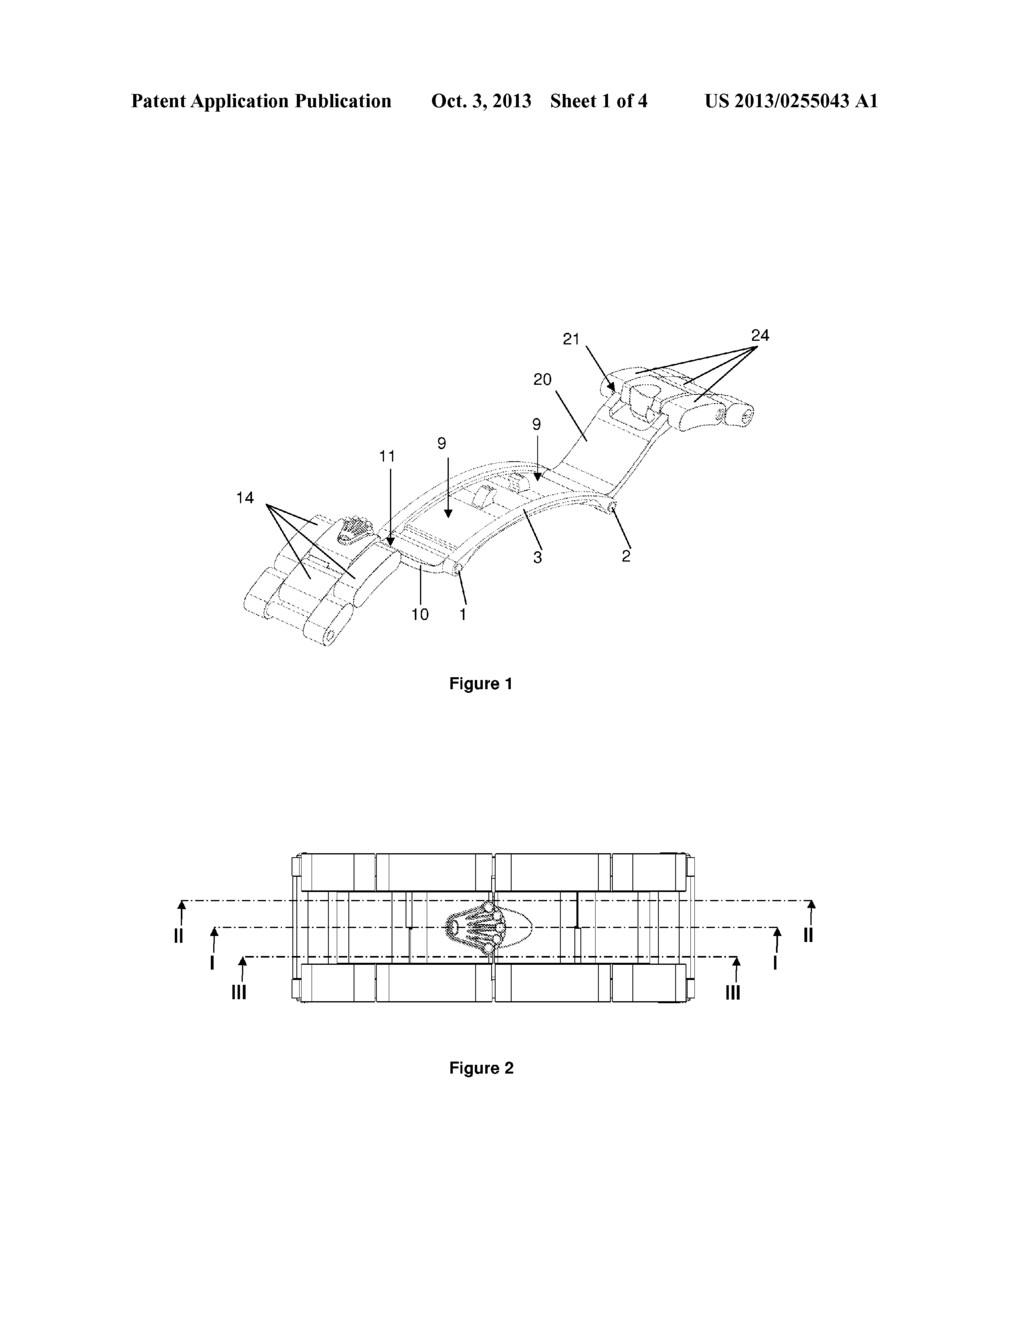 rolex-patent-5.jpg